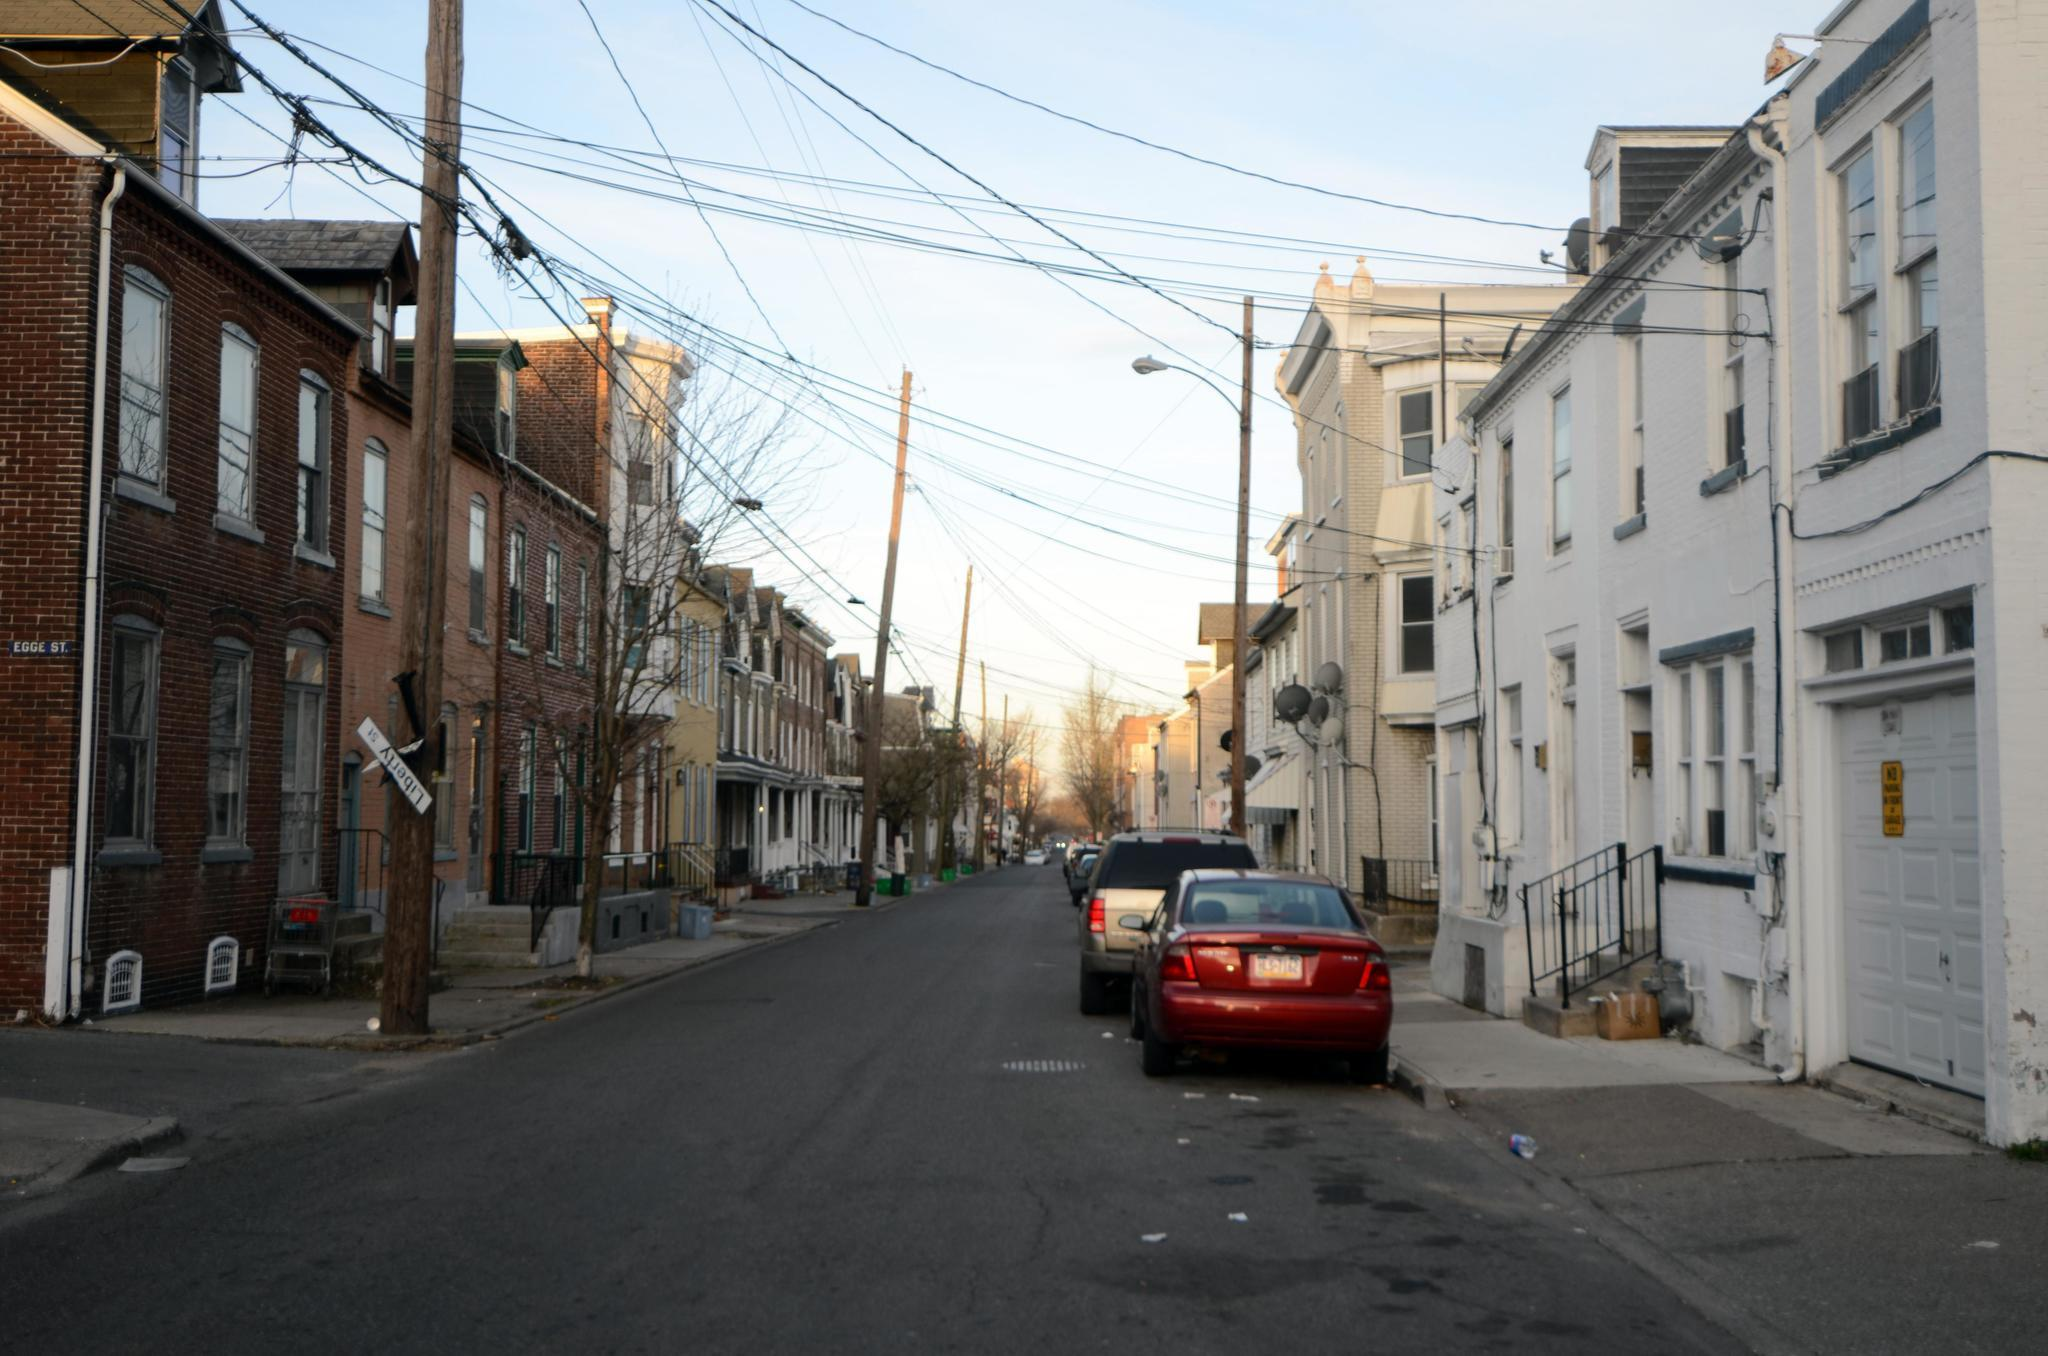 Double Shooting In Allentown: Boy, 11, Was 'unfortunate